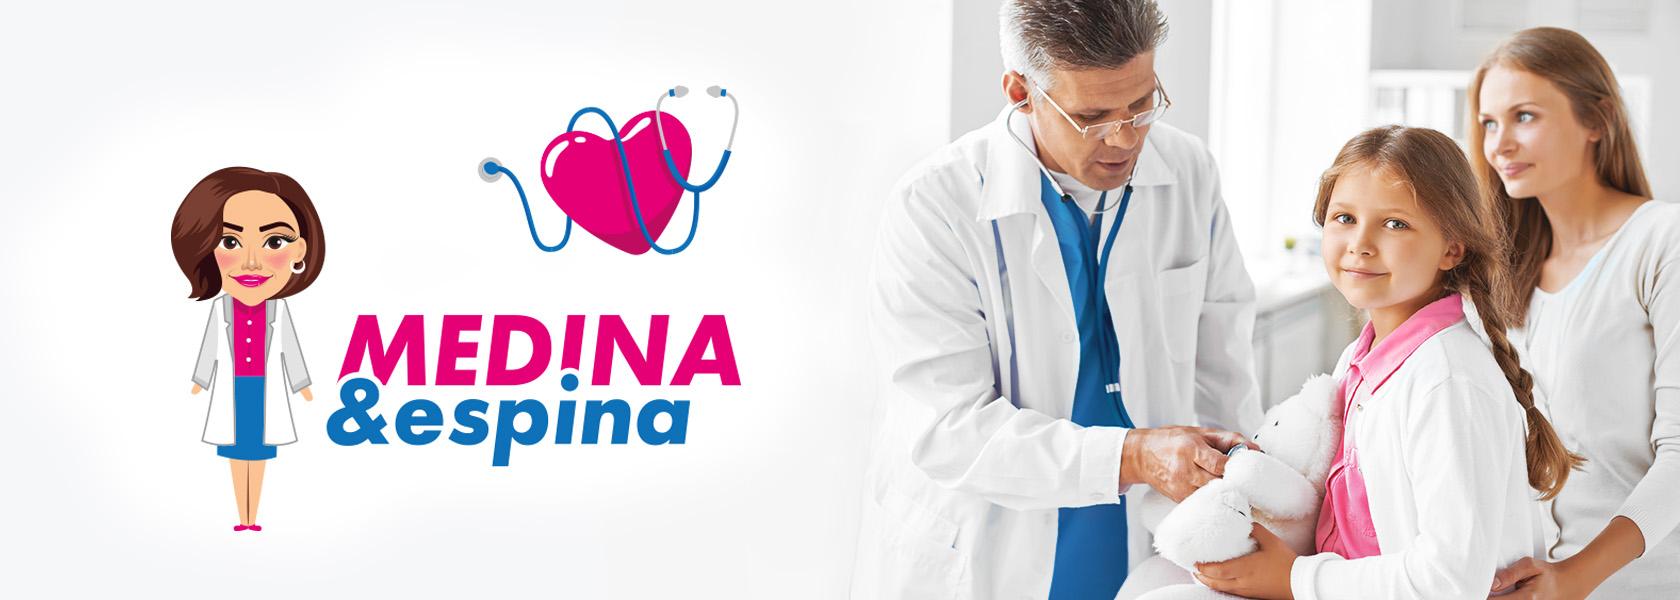 Medina Espina Разработка логотипа